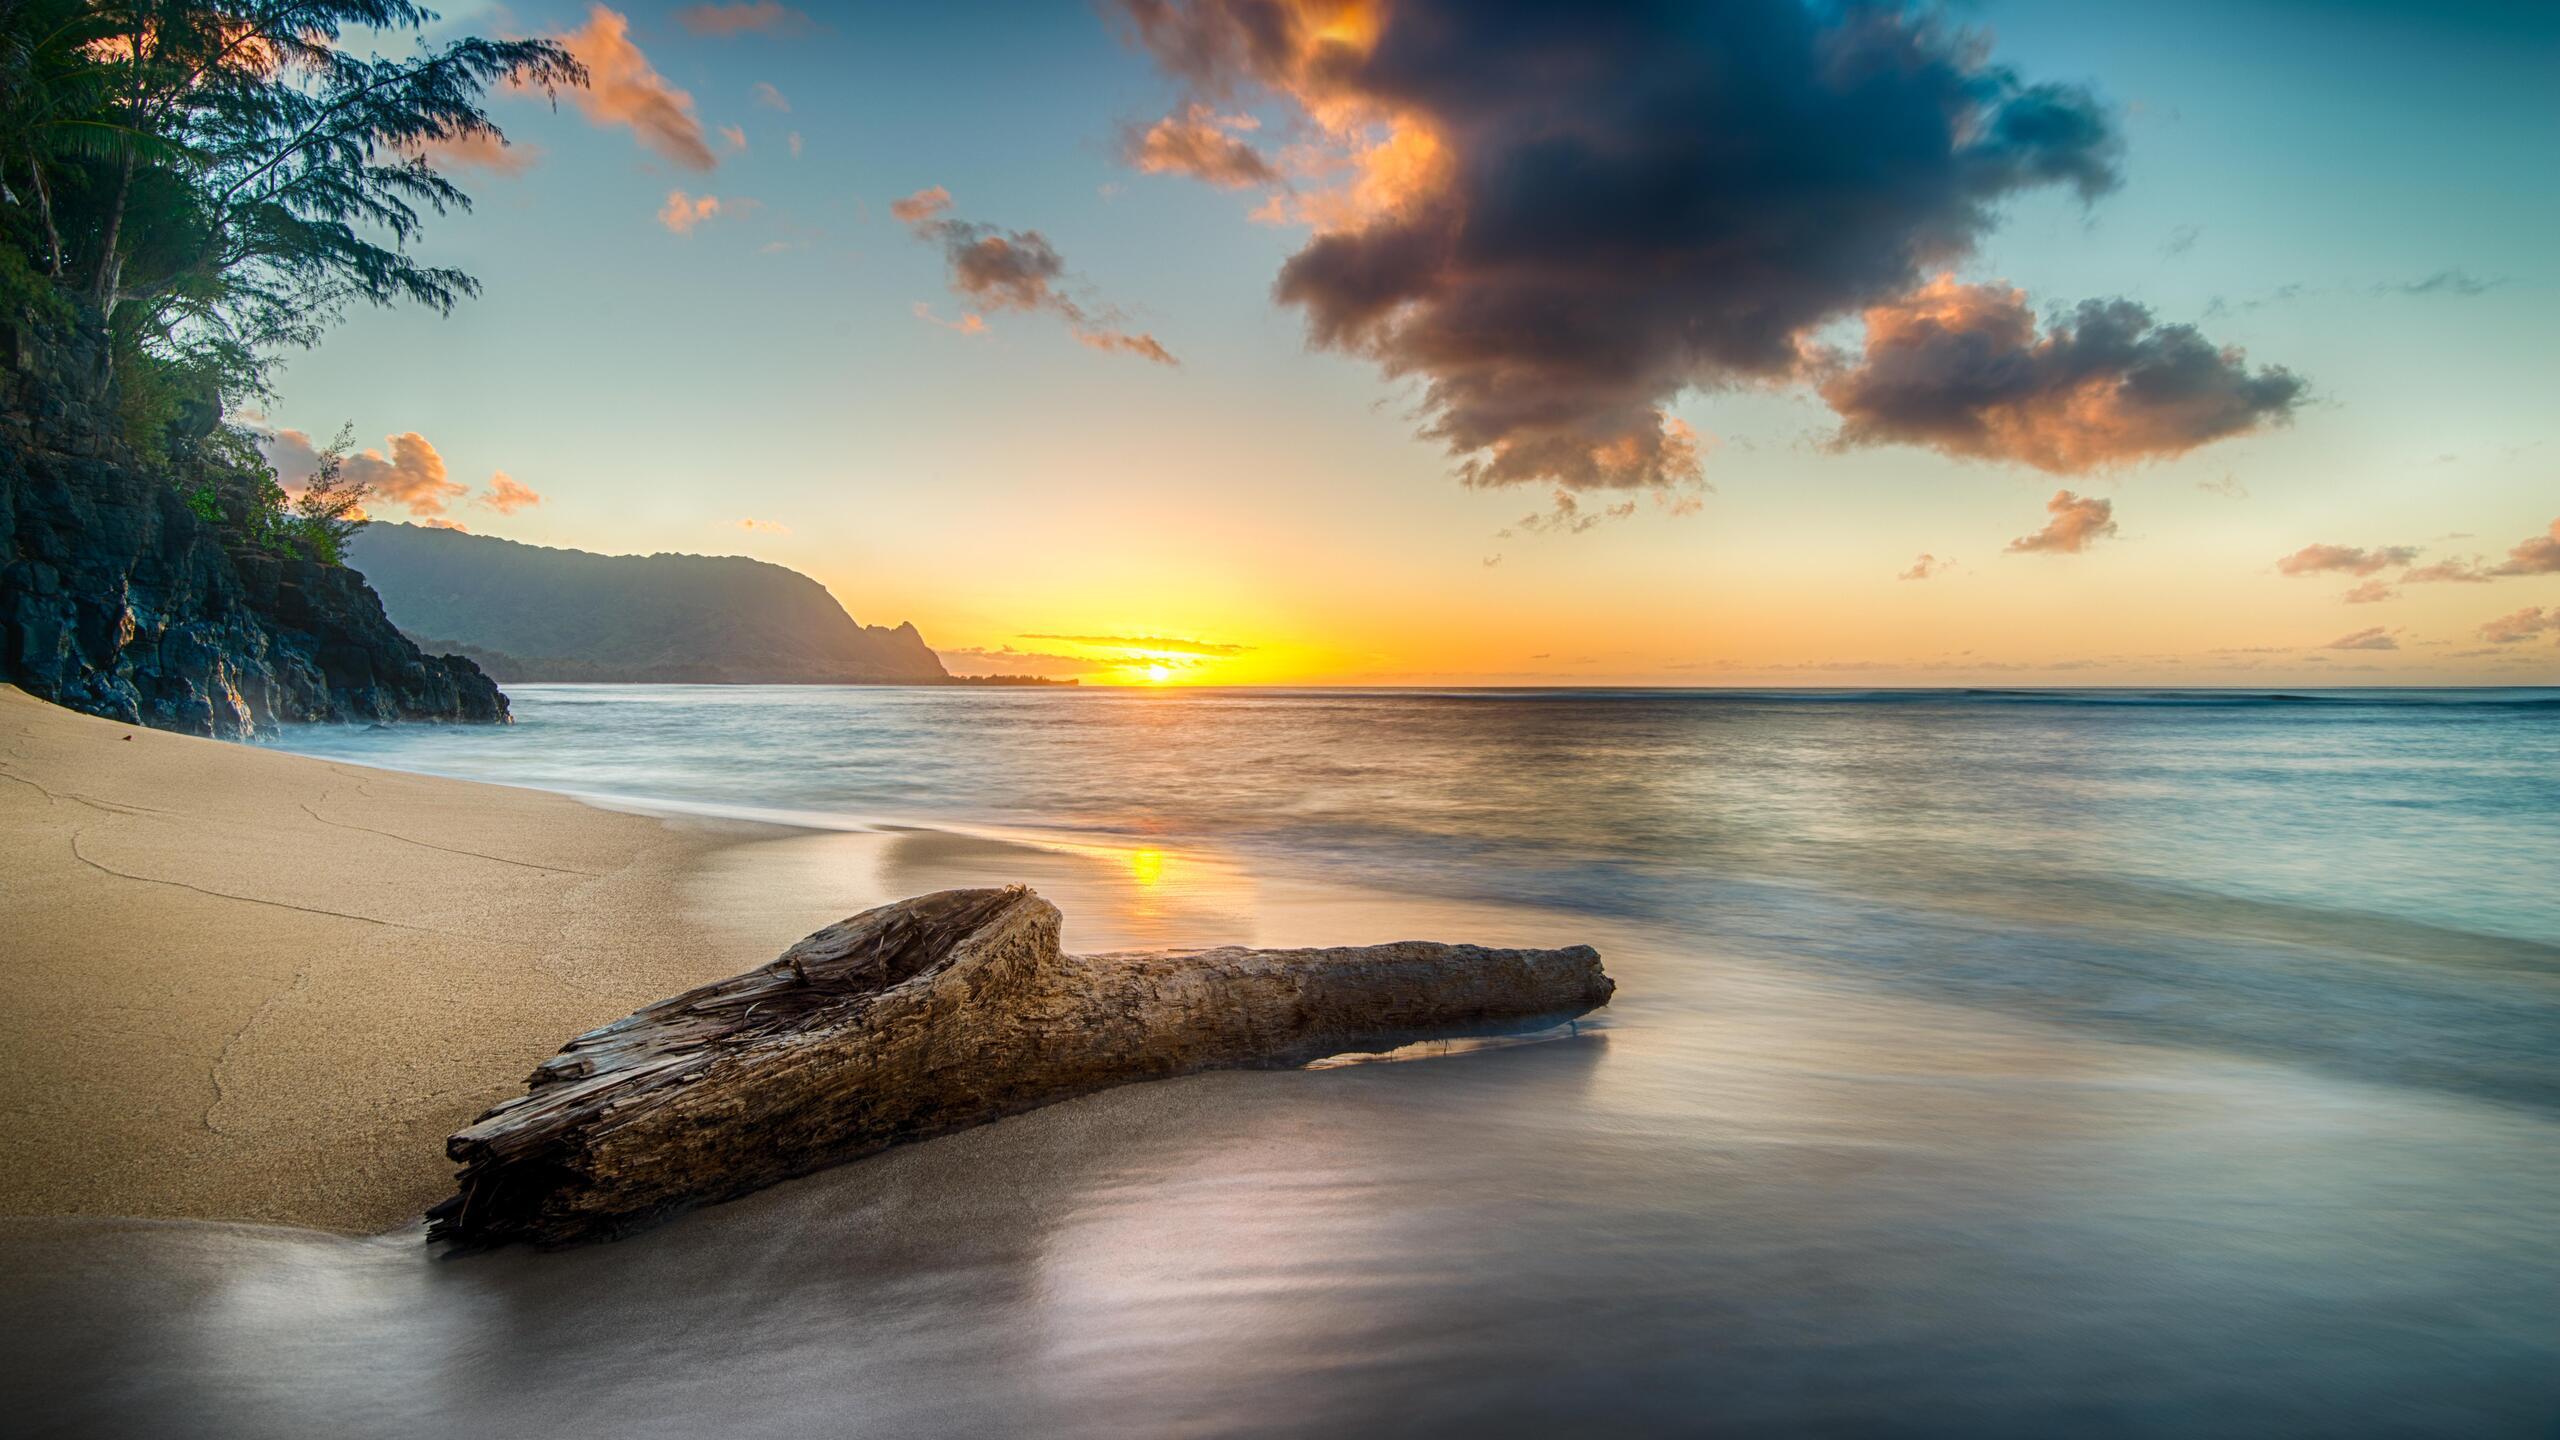 driftwood-on-beach-at-sunset-on-north-shore-of-kauai-8k-pc.jpg